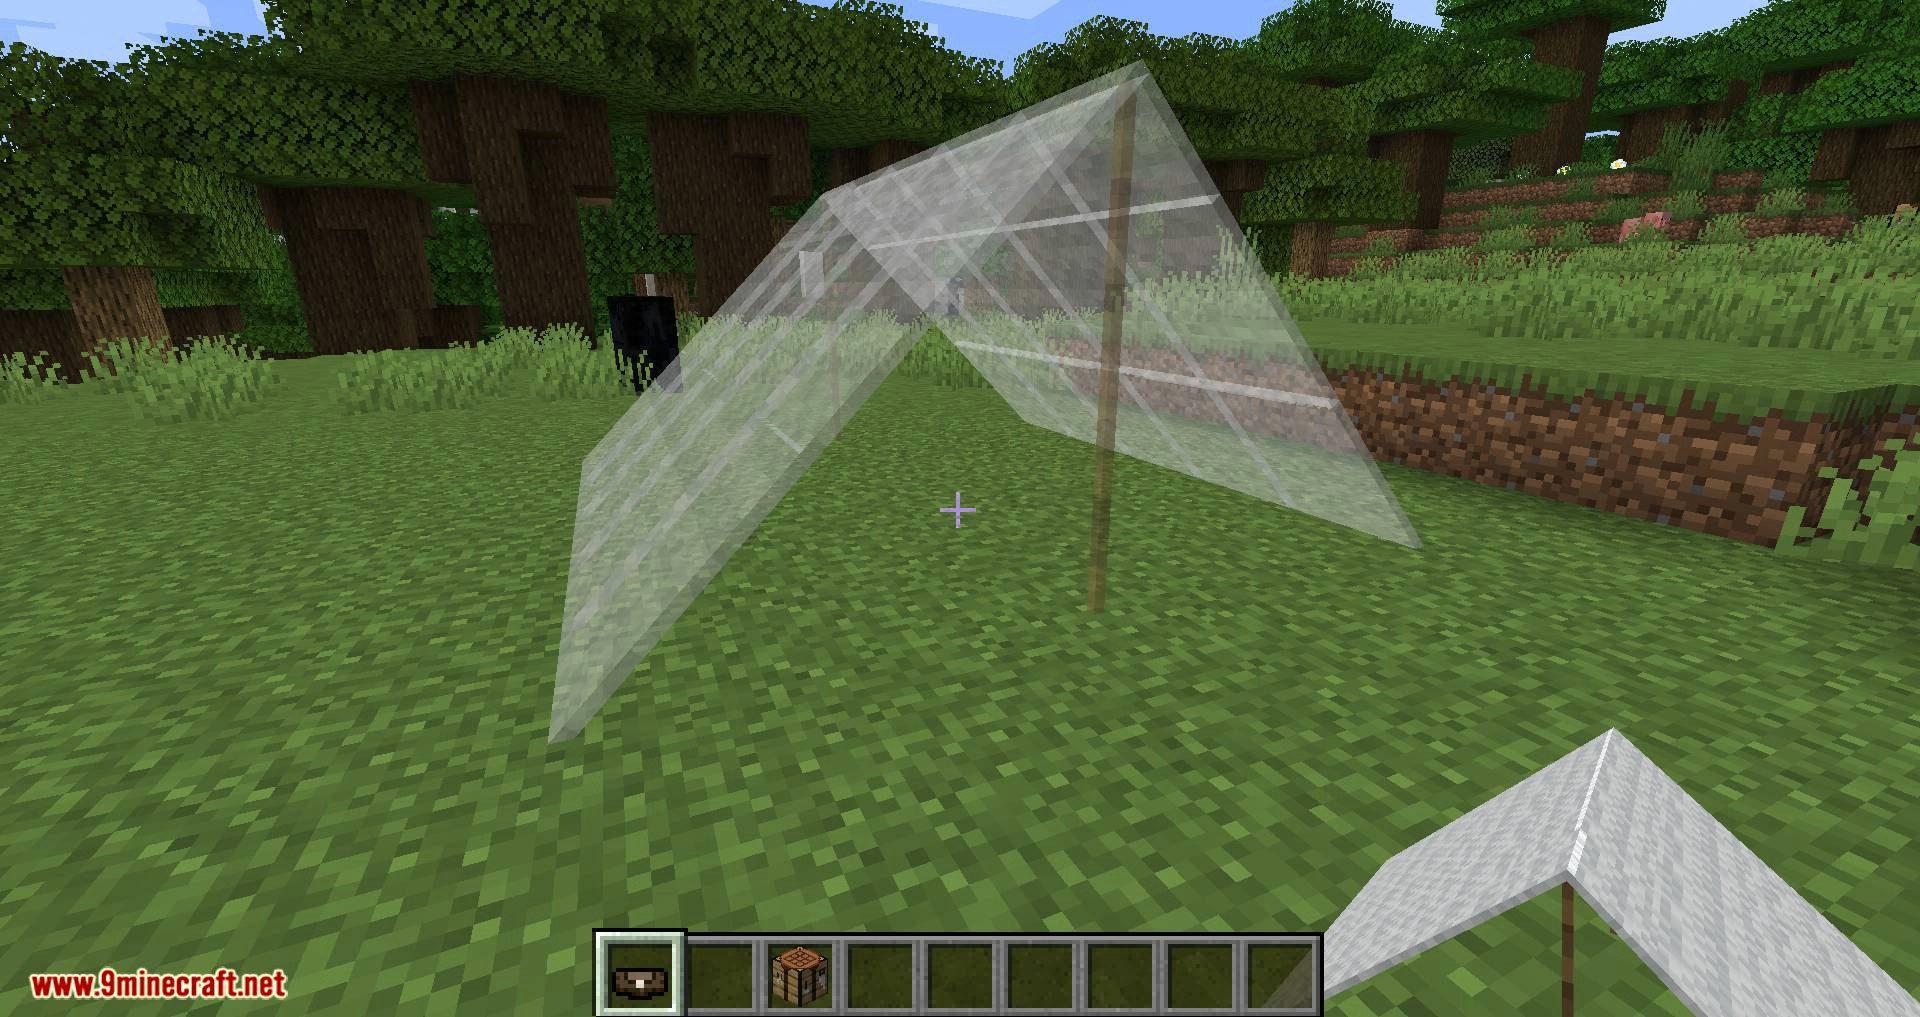 Campanion mod for minecraft 12